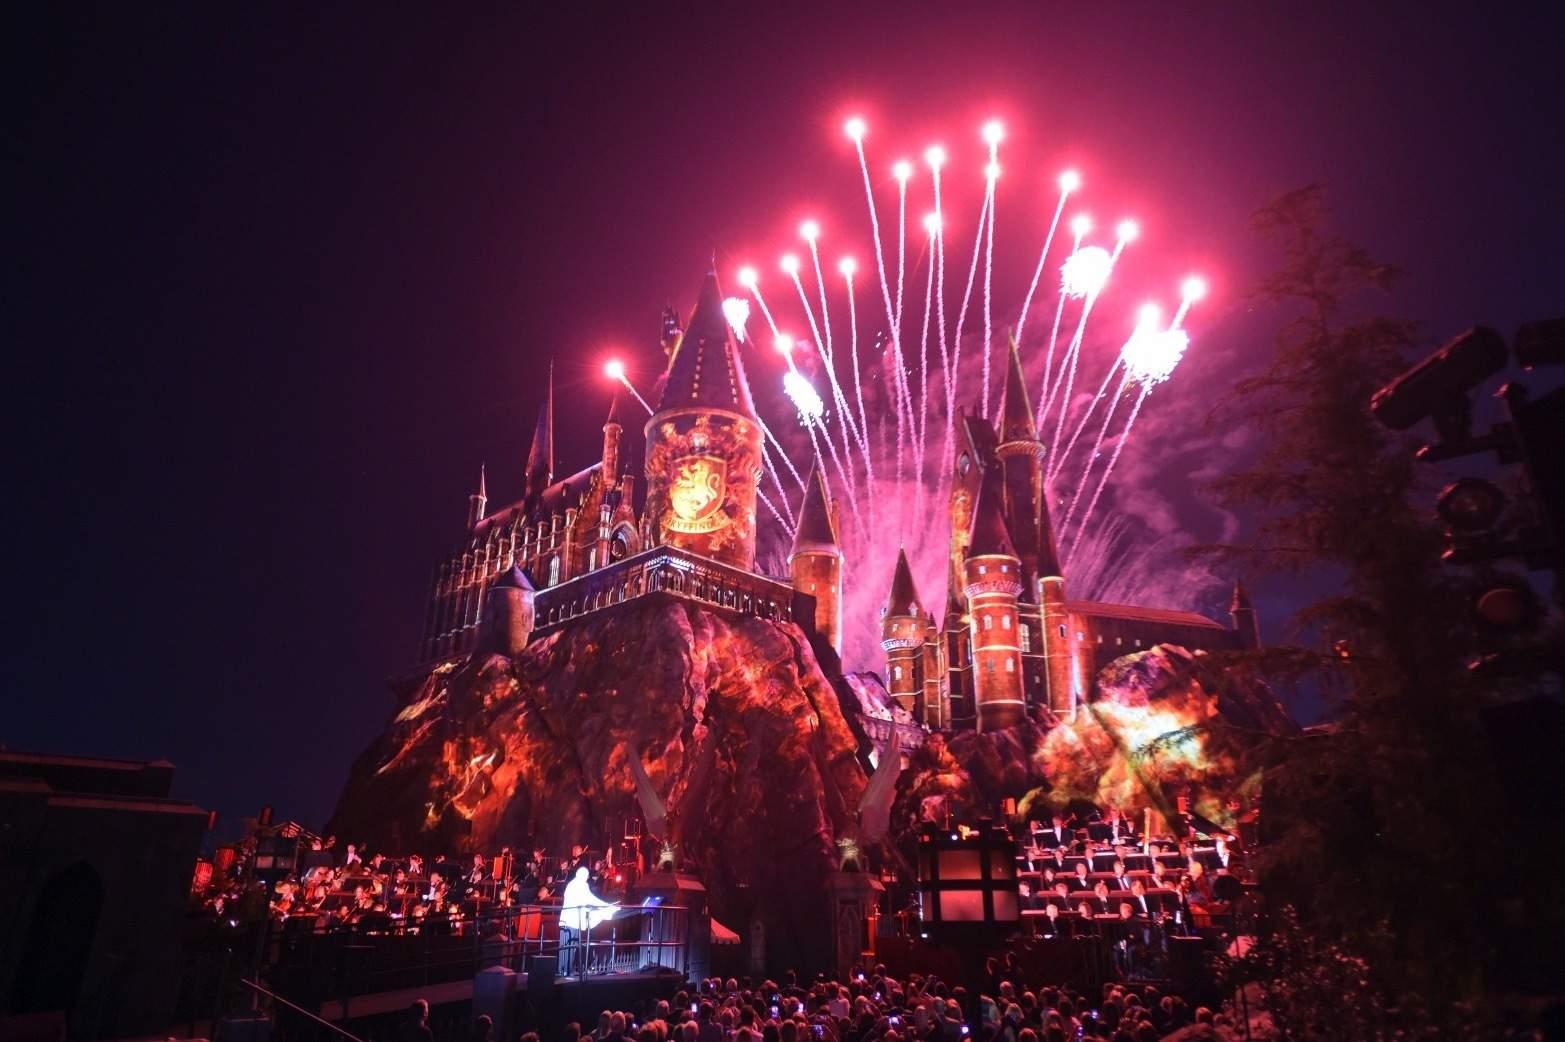 RUMOR: Universal's New Harry Potter Nighttime Show